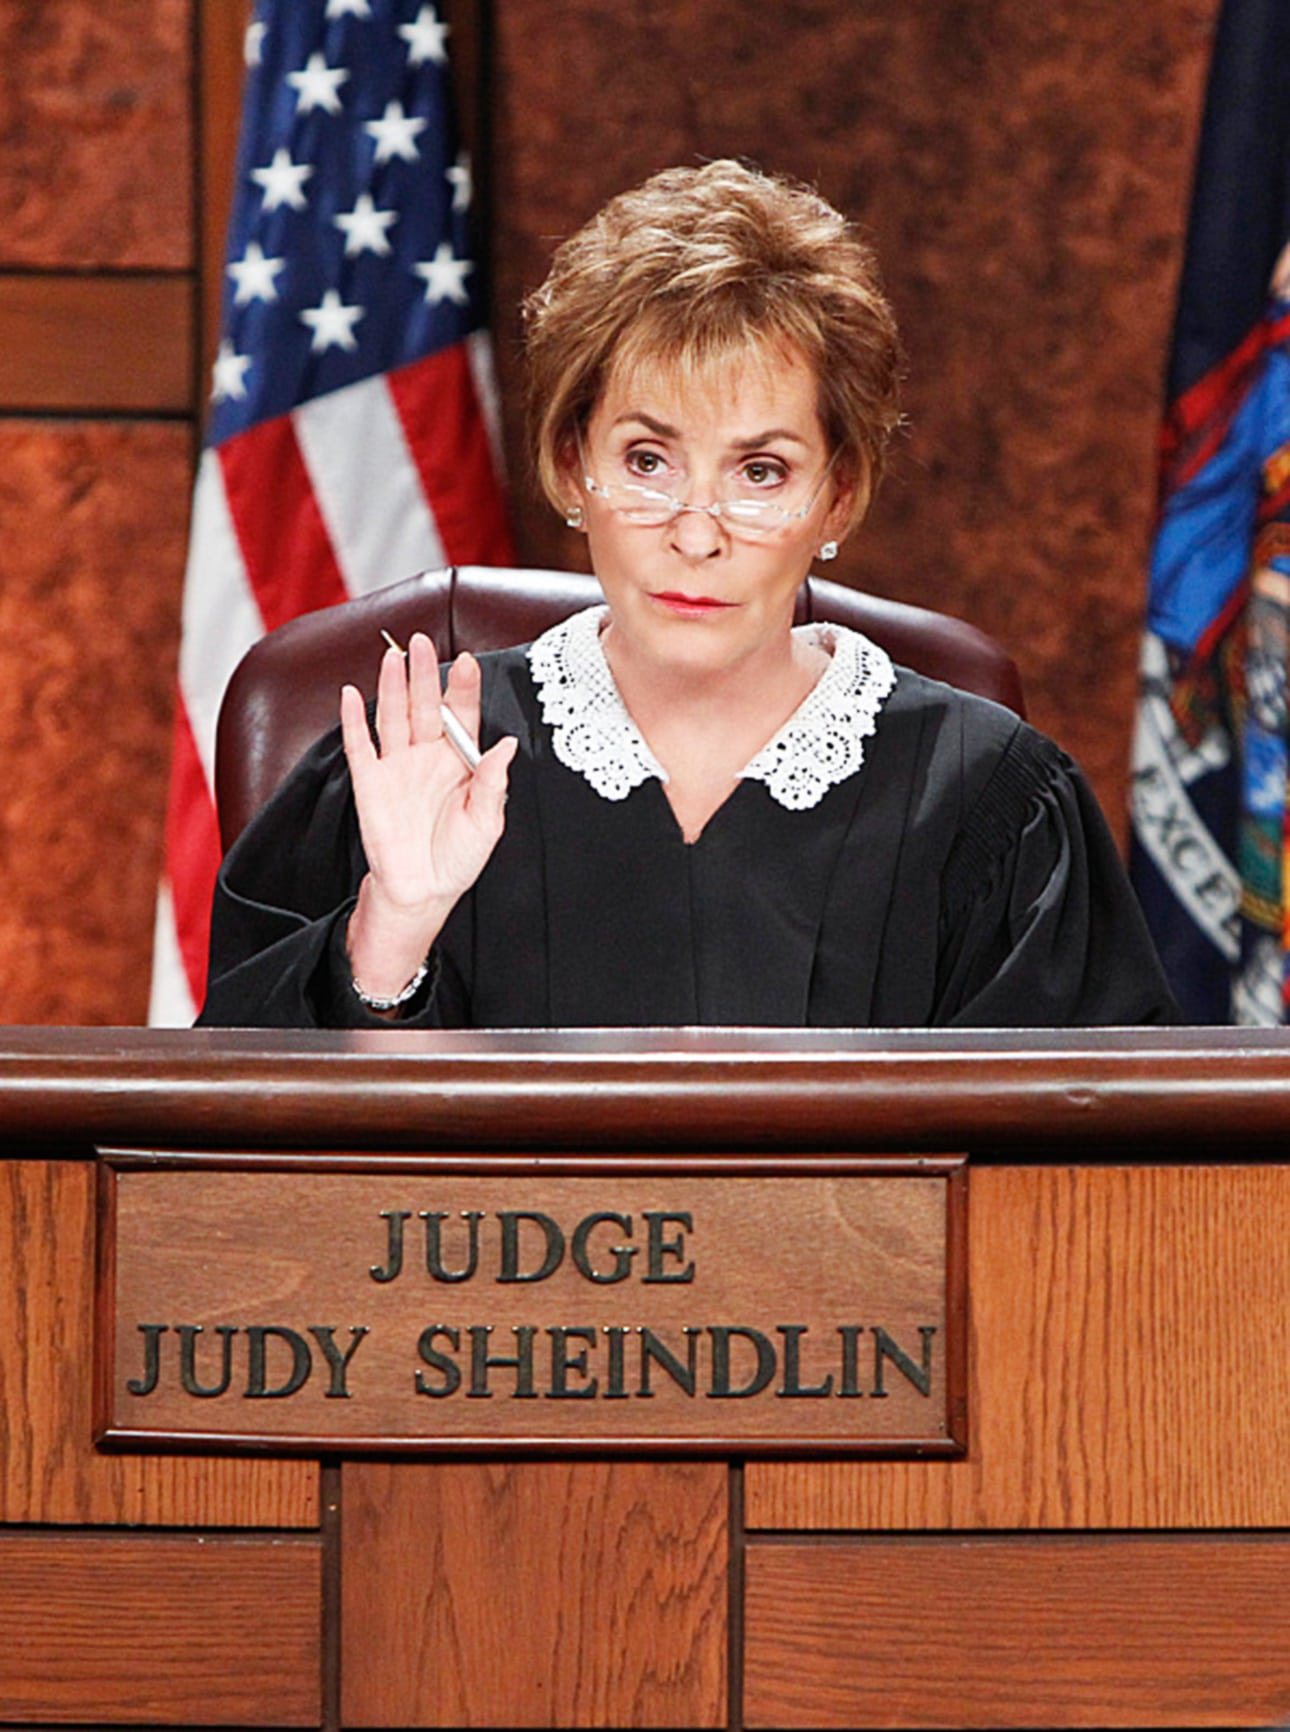 JUDGE JUDY PRIMETIME, Judge Judy Sheindlin